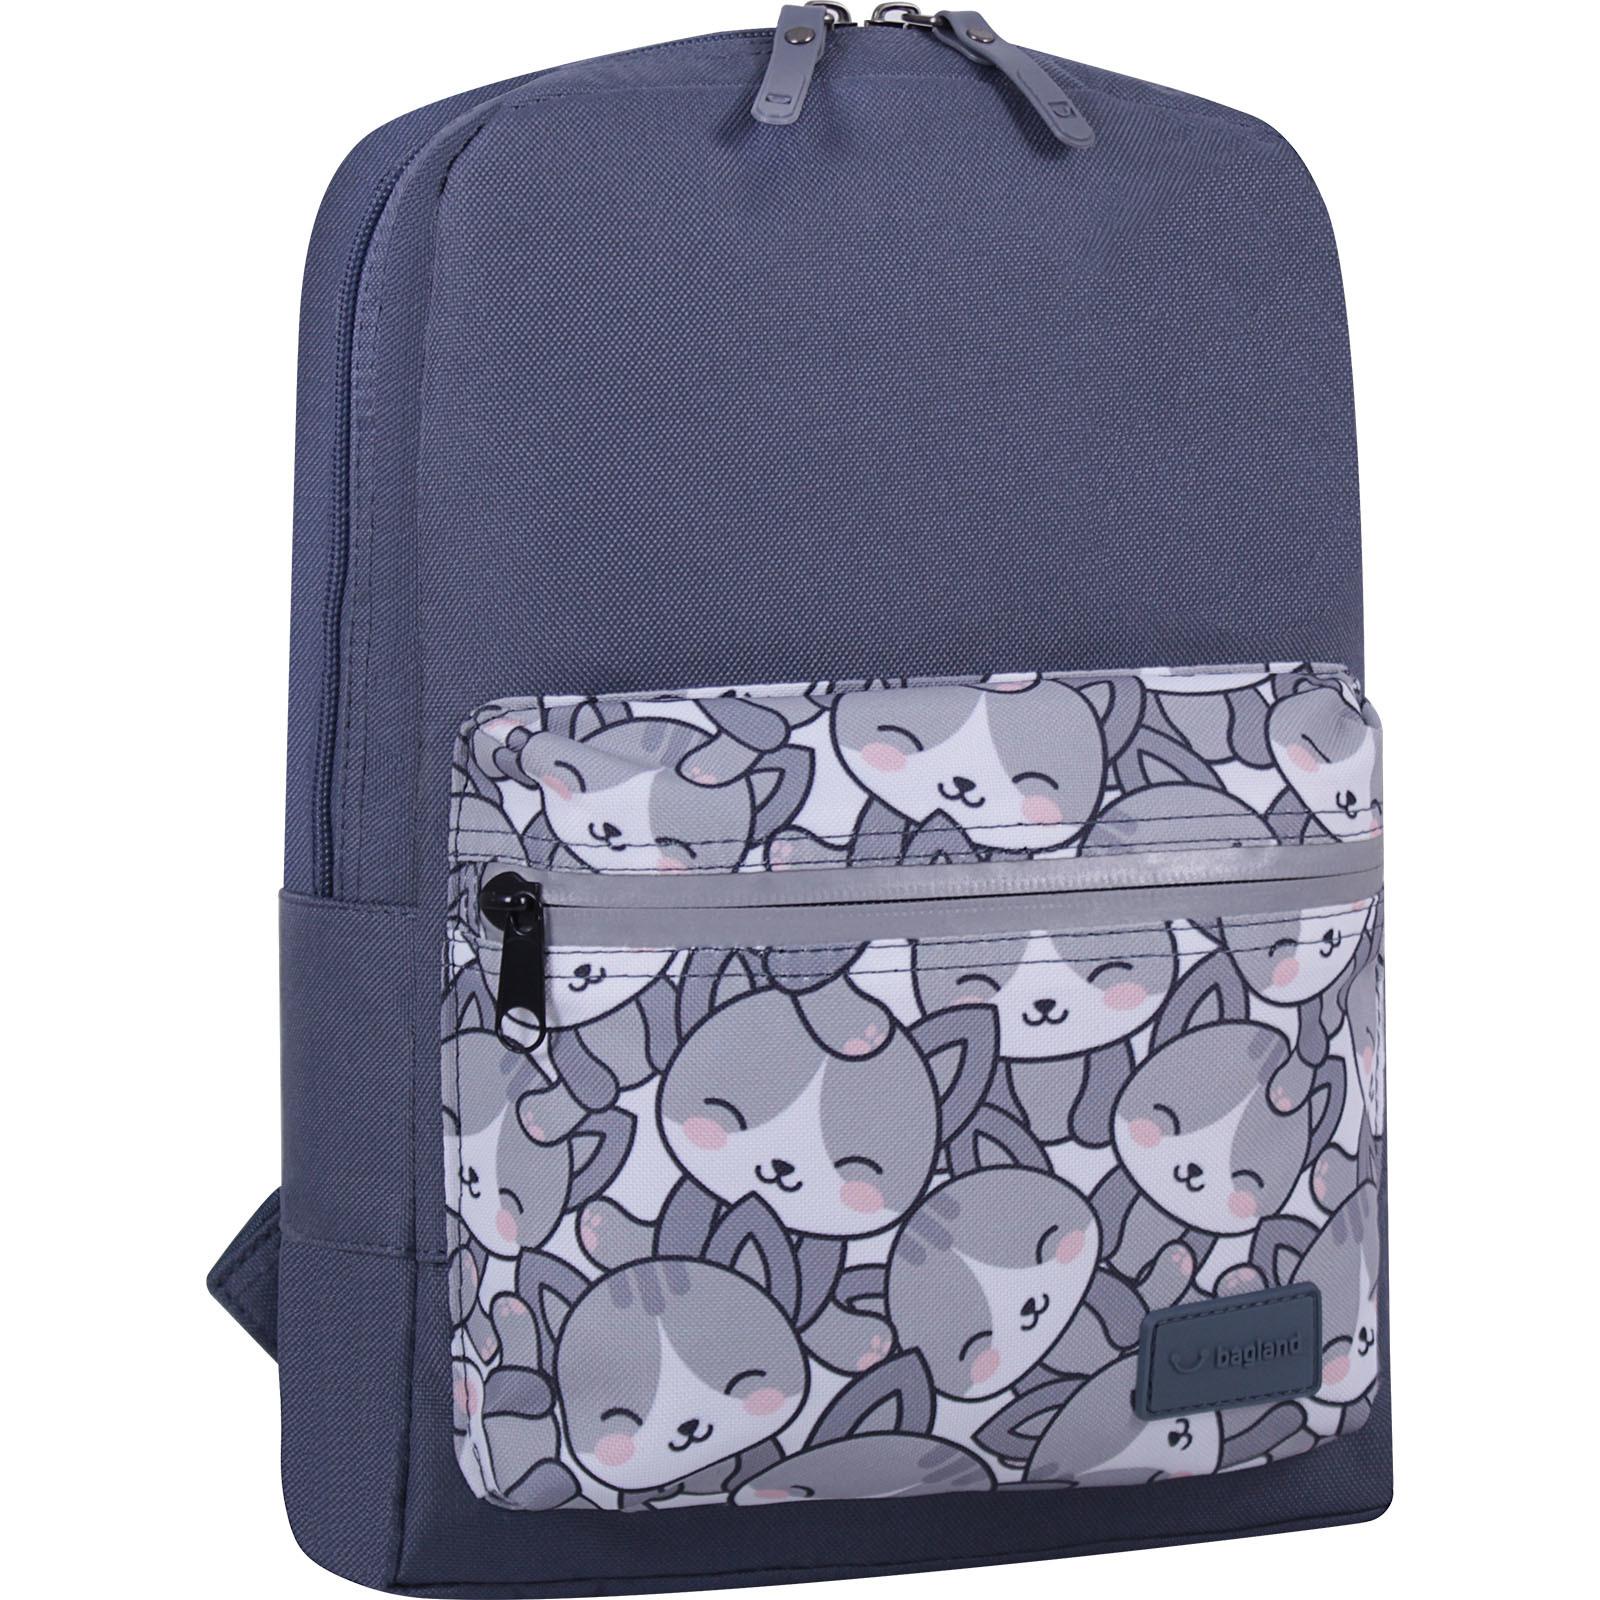 Детские рюкзаки Рюкзак Bagland Молодежный mini 8 л. серый 756 (0050866) IMG_6755_суб756_-1600.jpg